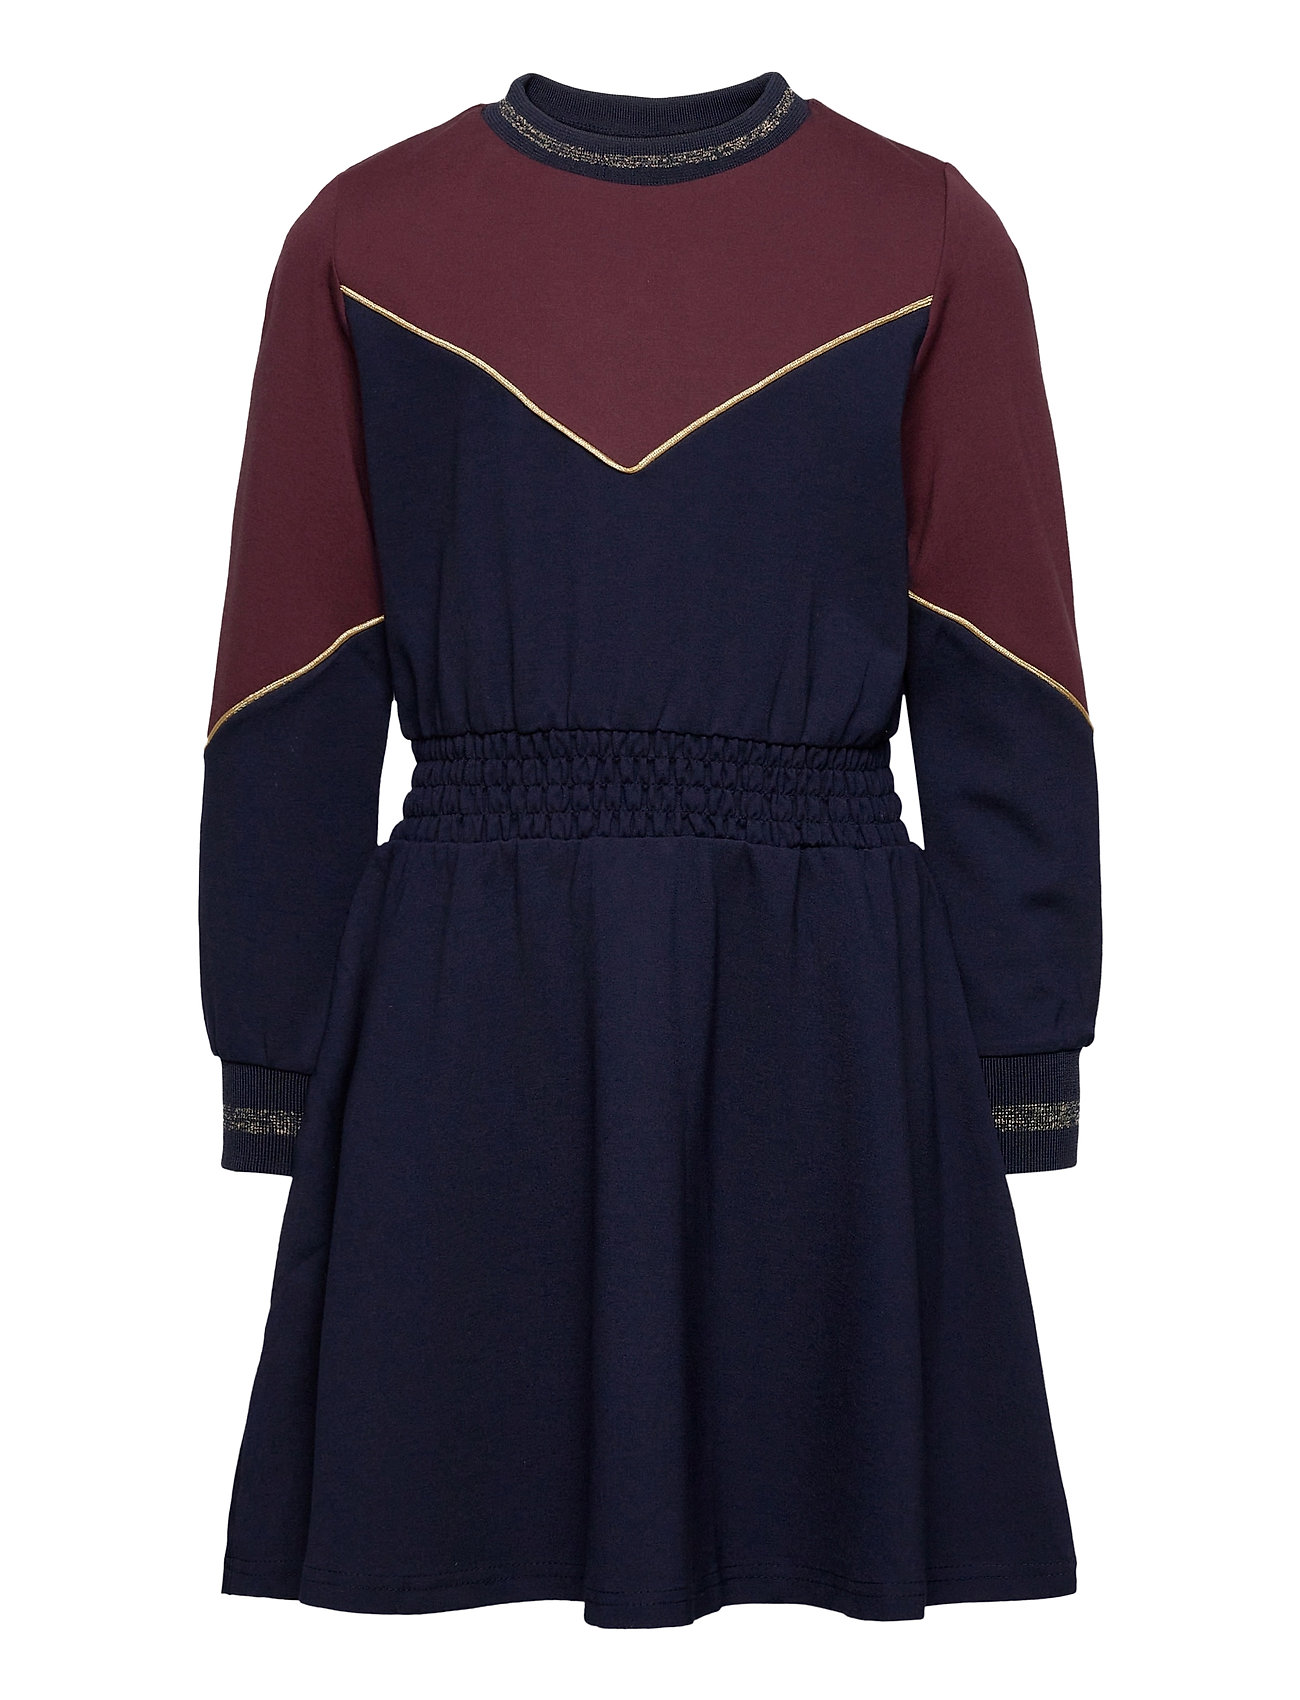 Image of Rosa L_s Dress Kjole Blå The New (3452244411)